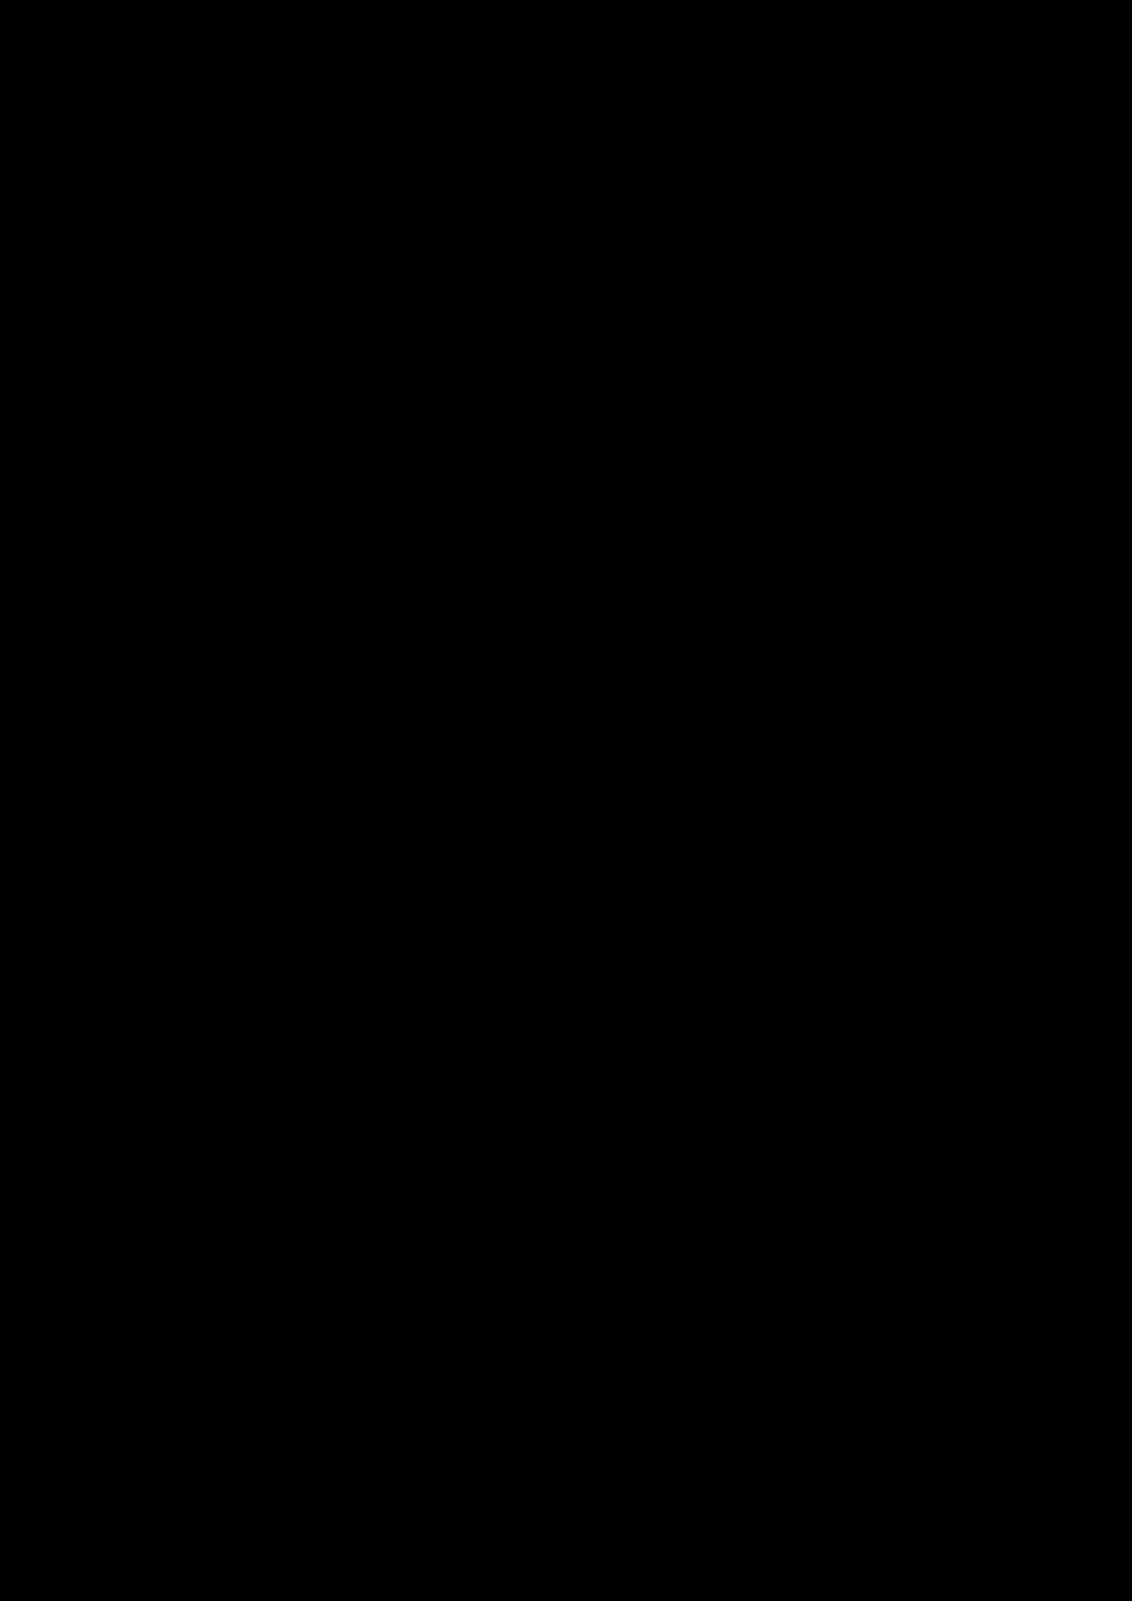 Okean Pustotyi slide, Image 51